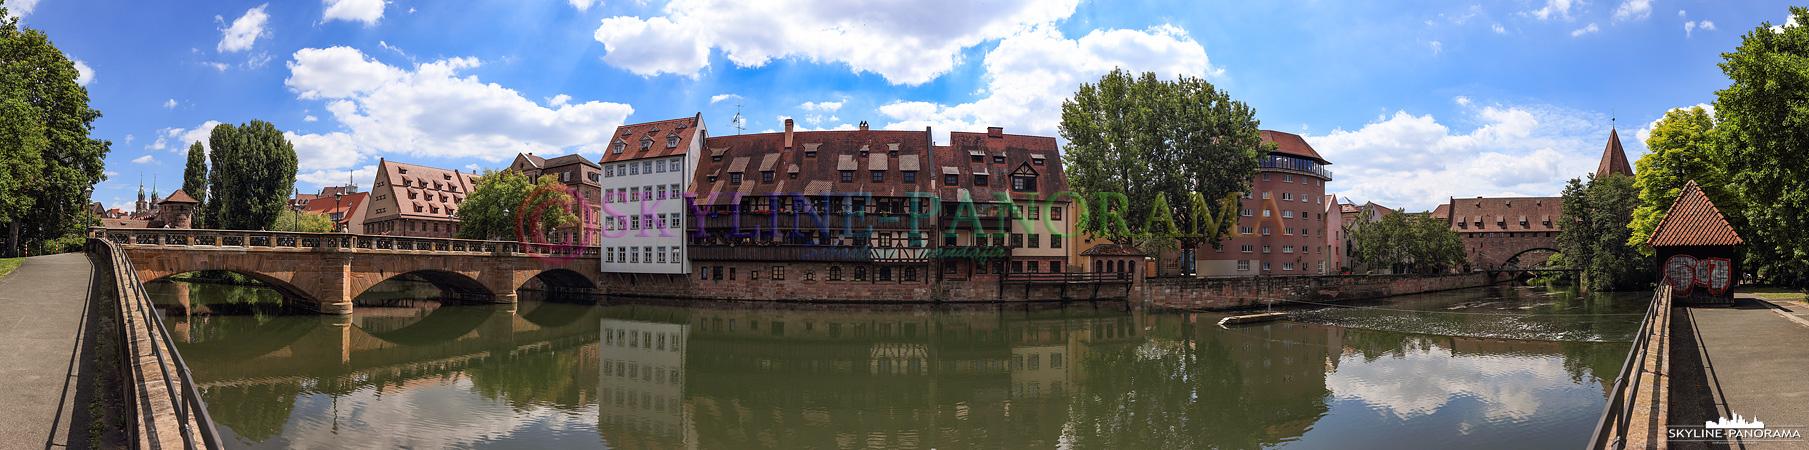 Altstadt Panorama an der Pegnitz